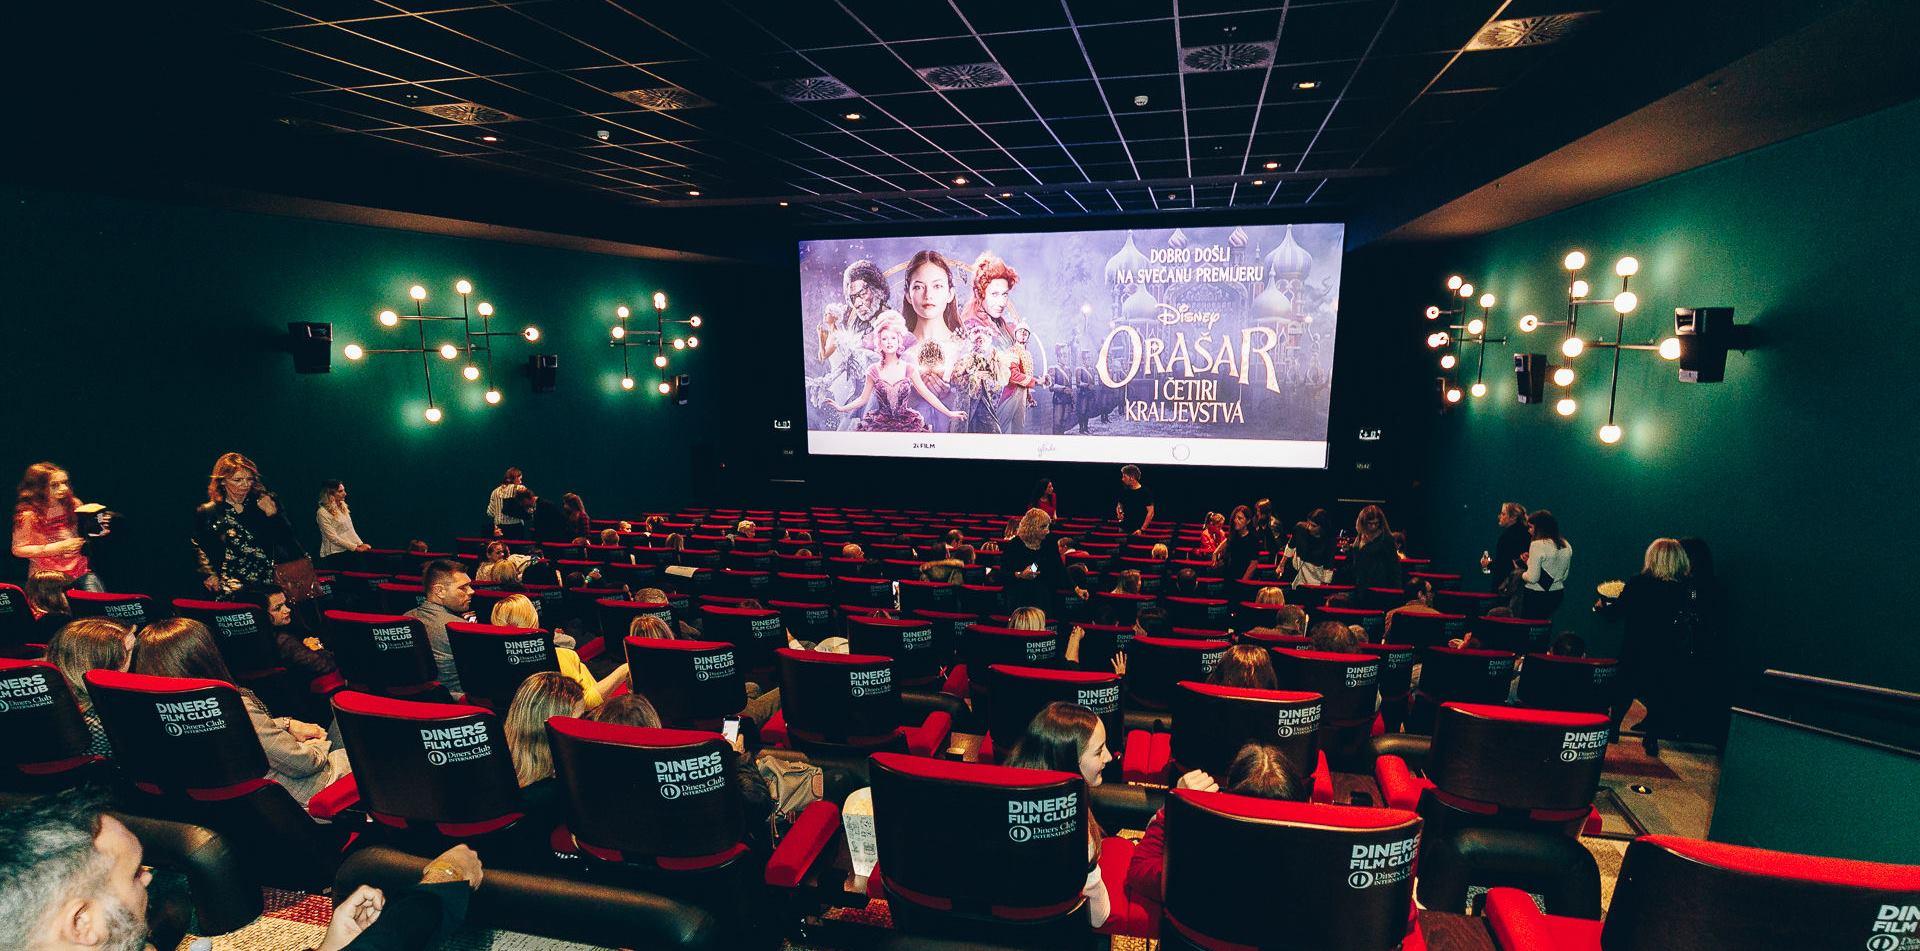 Fotogalerija s premijere Disneyjevog filma 'Orašar i četiri kraljevstva'